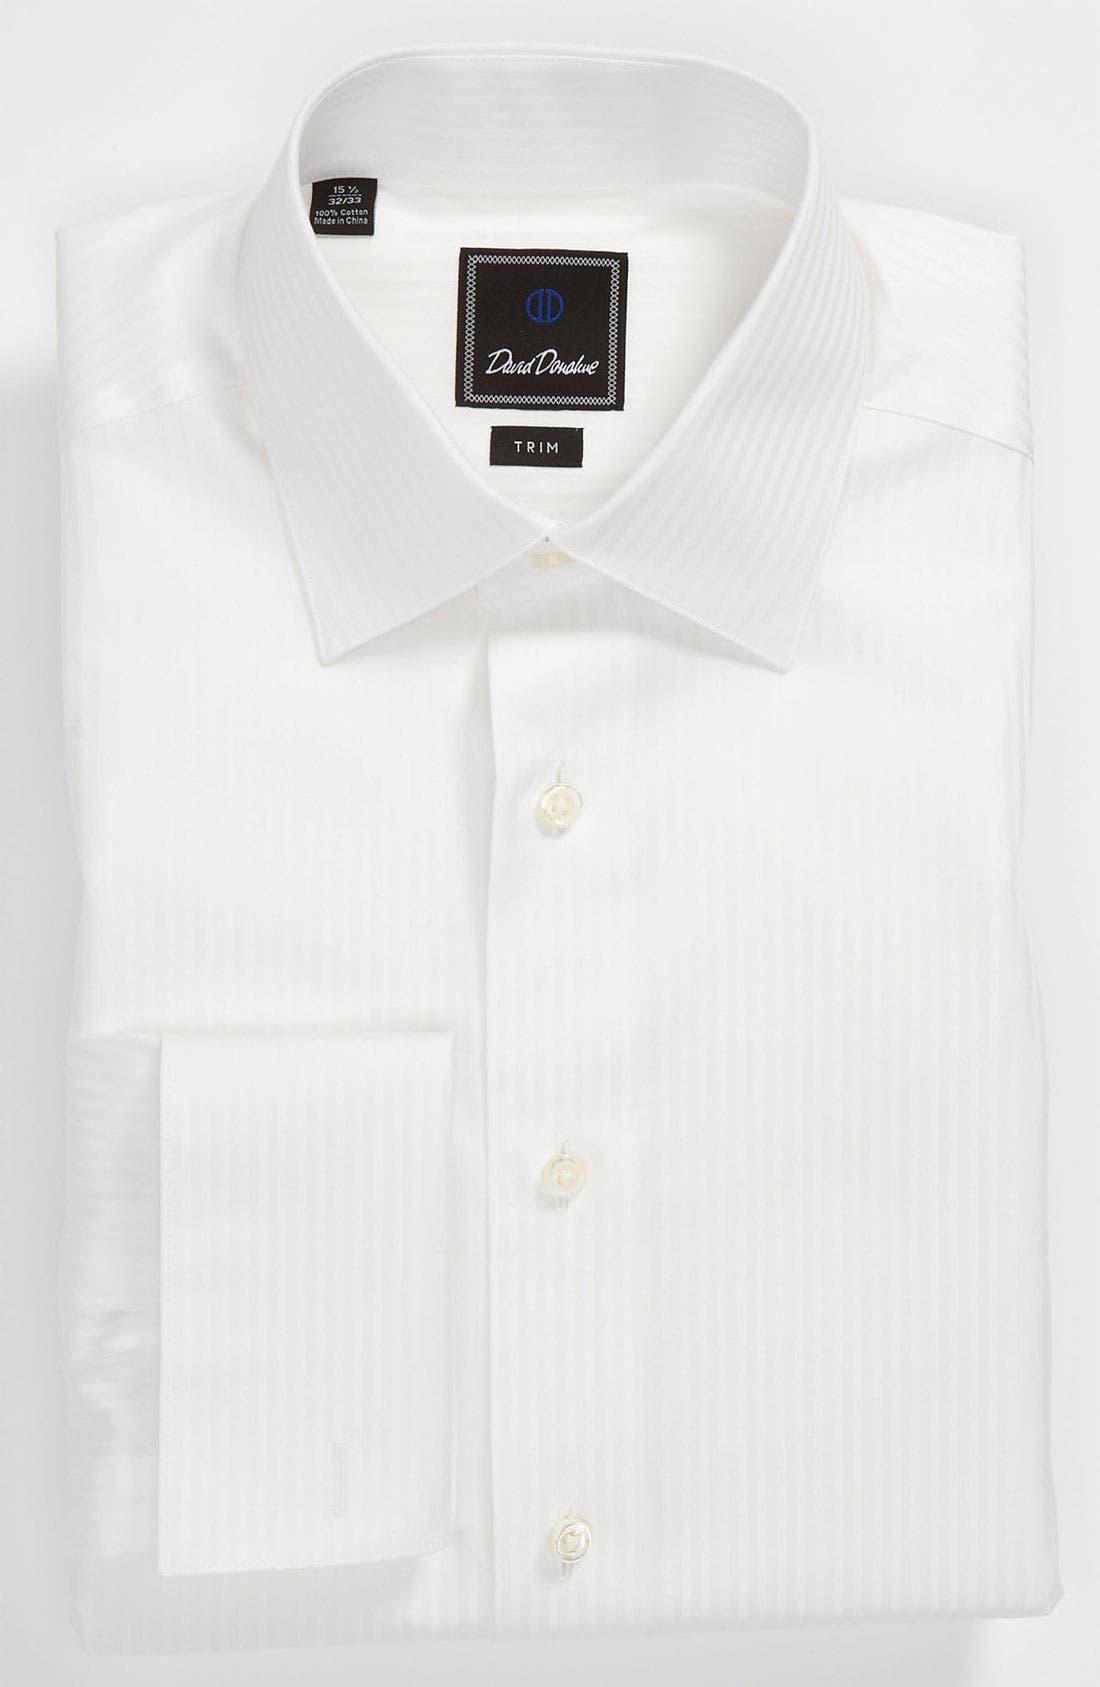 Alternate Image 1 Selected - David Donahue Trim Fit Tuxedo Shirt